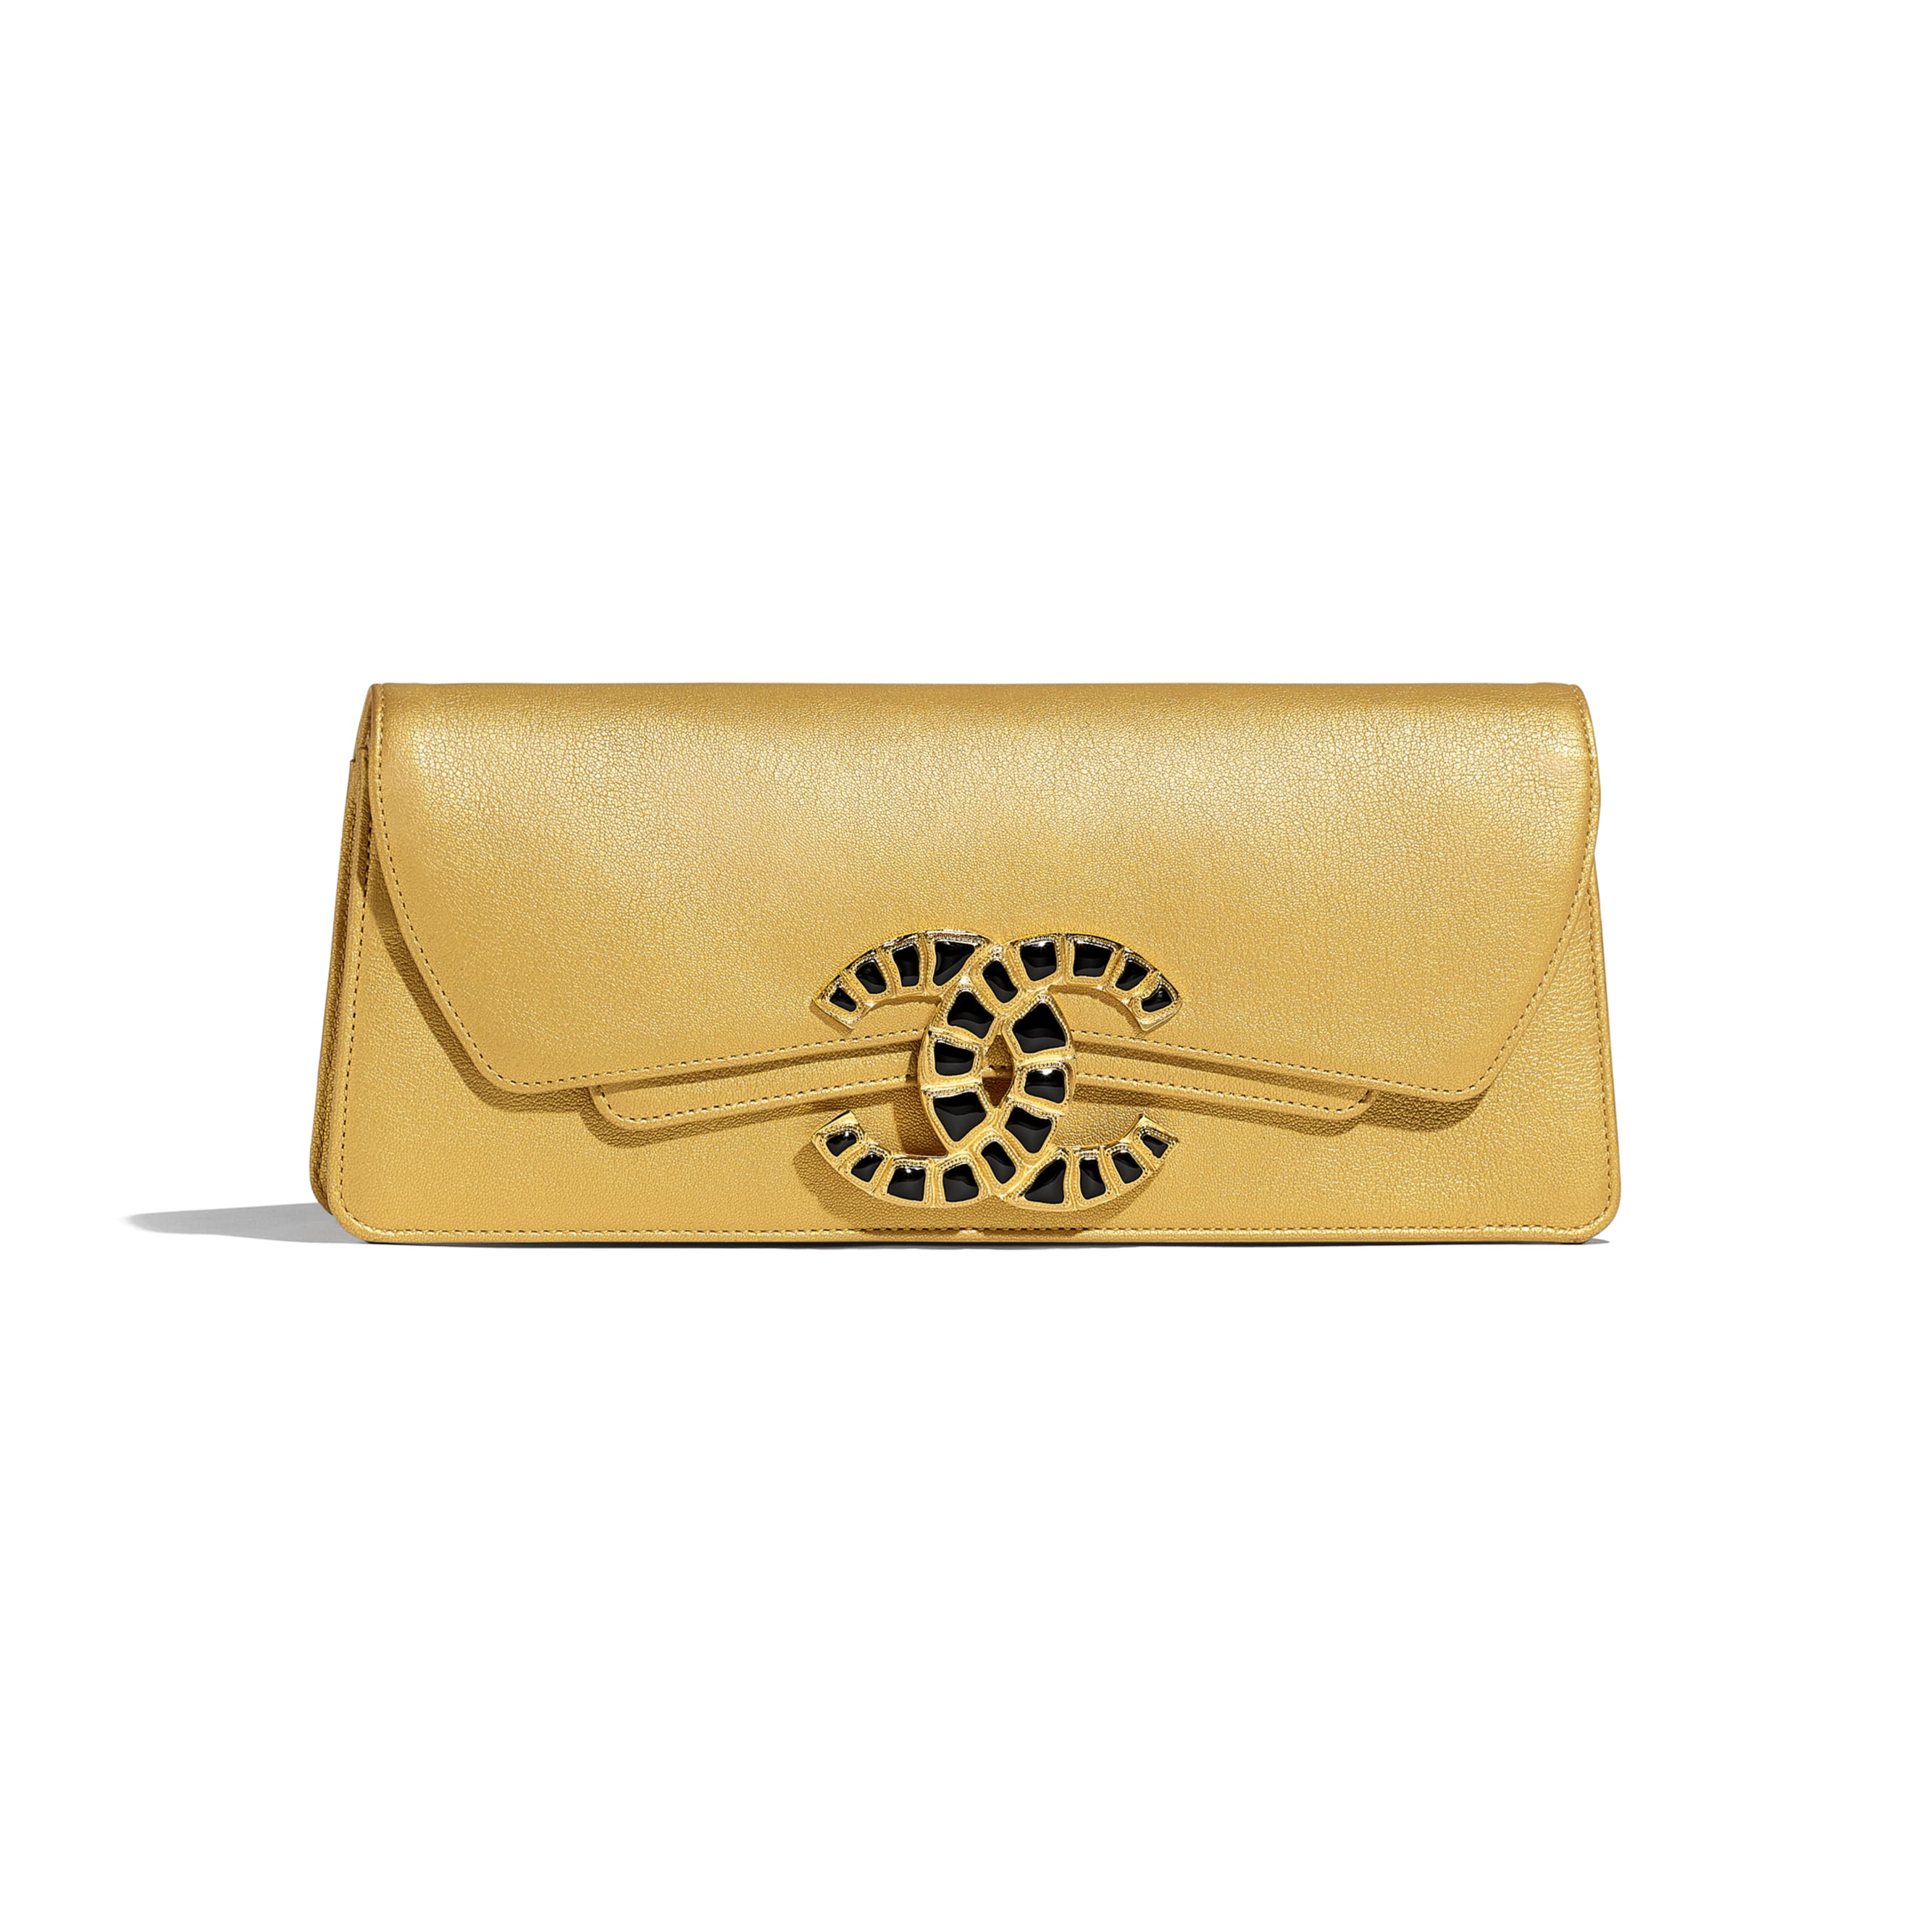 Clutch - Gold - Metallic Lambskin & Gold-Tone Metal - Default view - see standard sized version